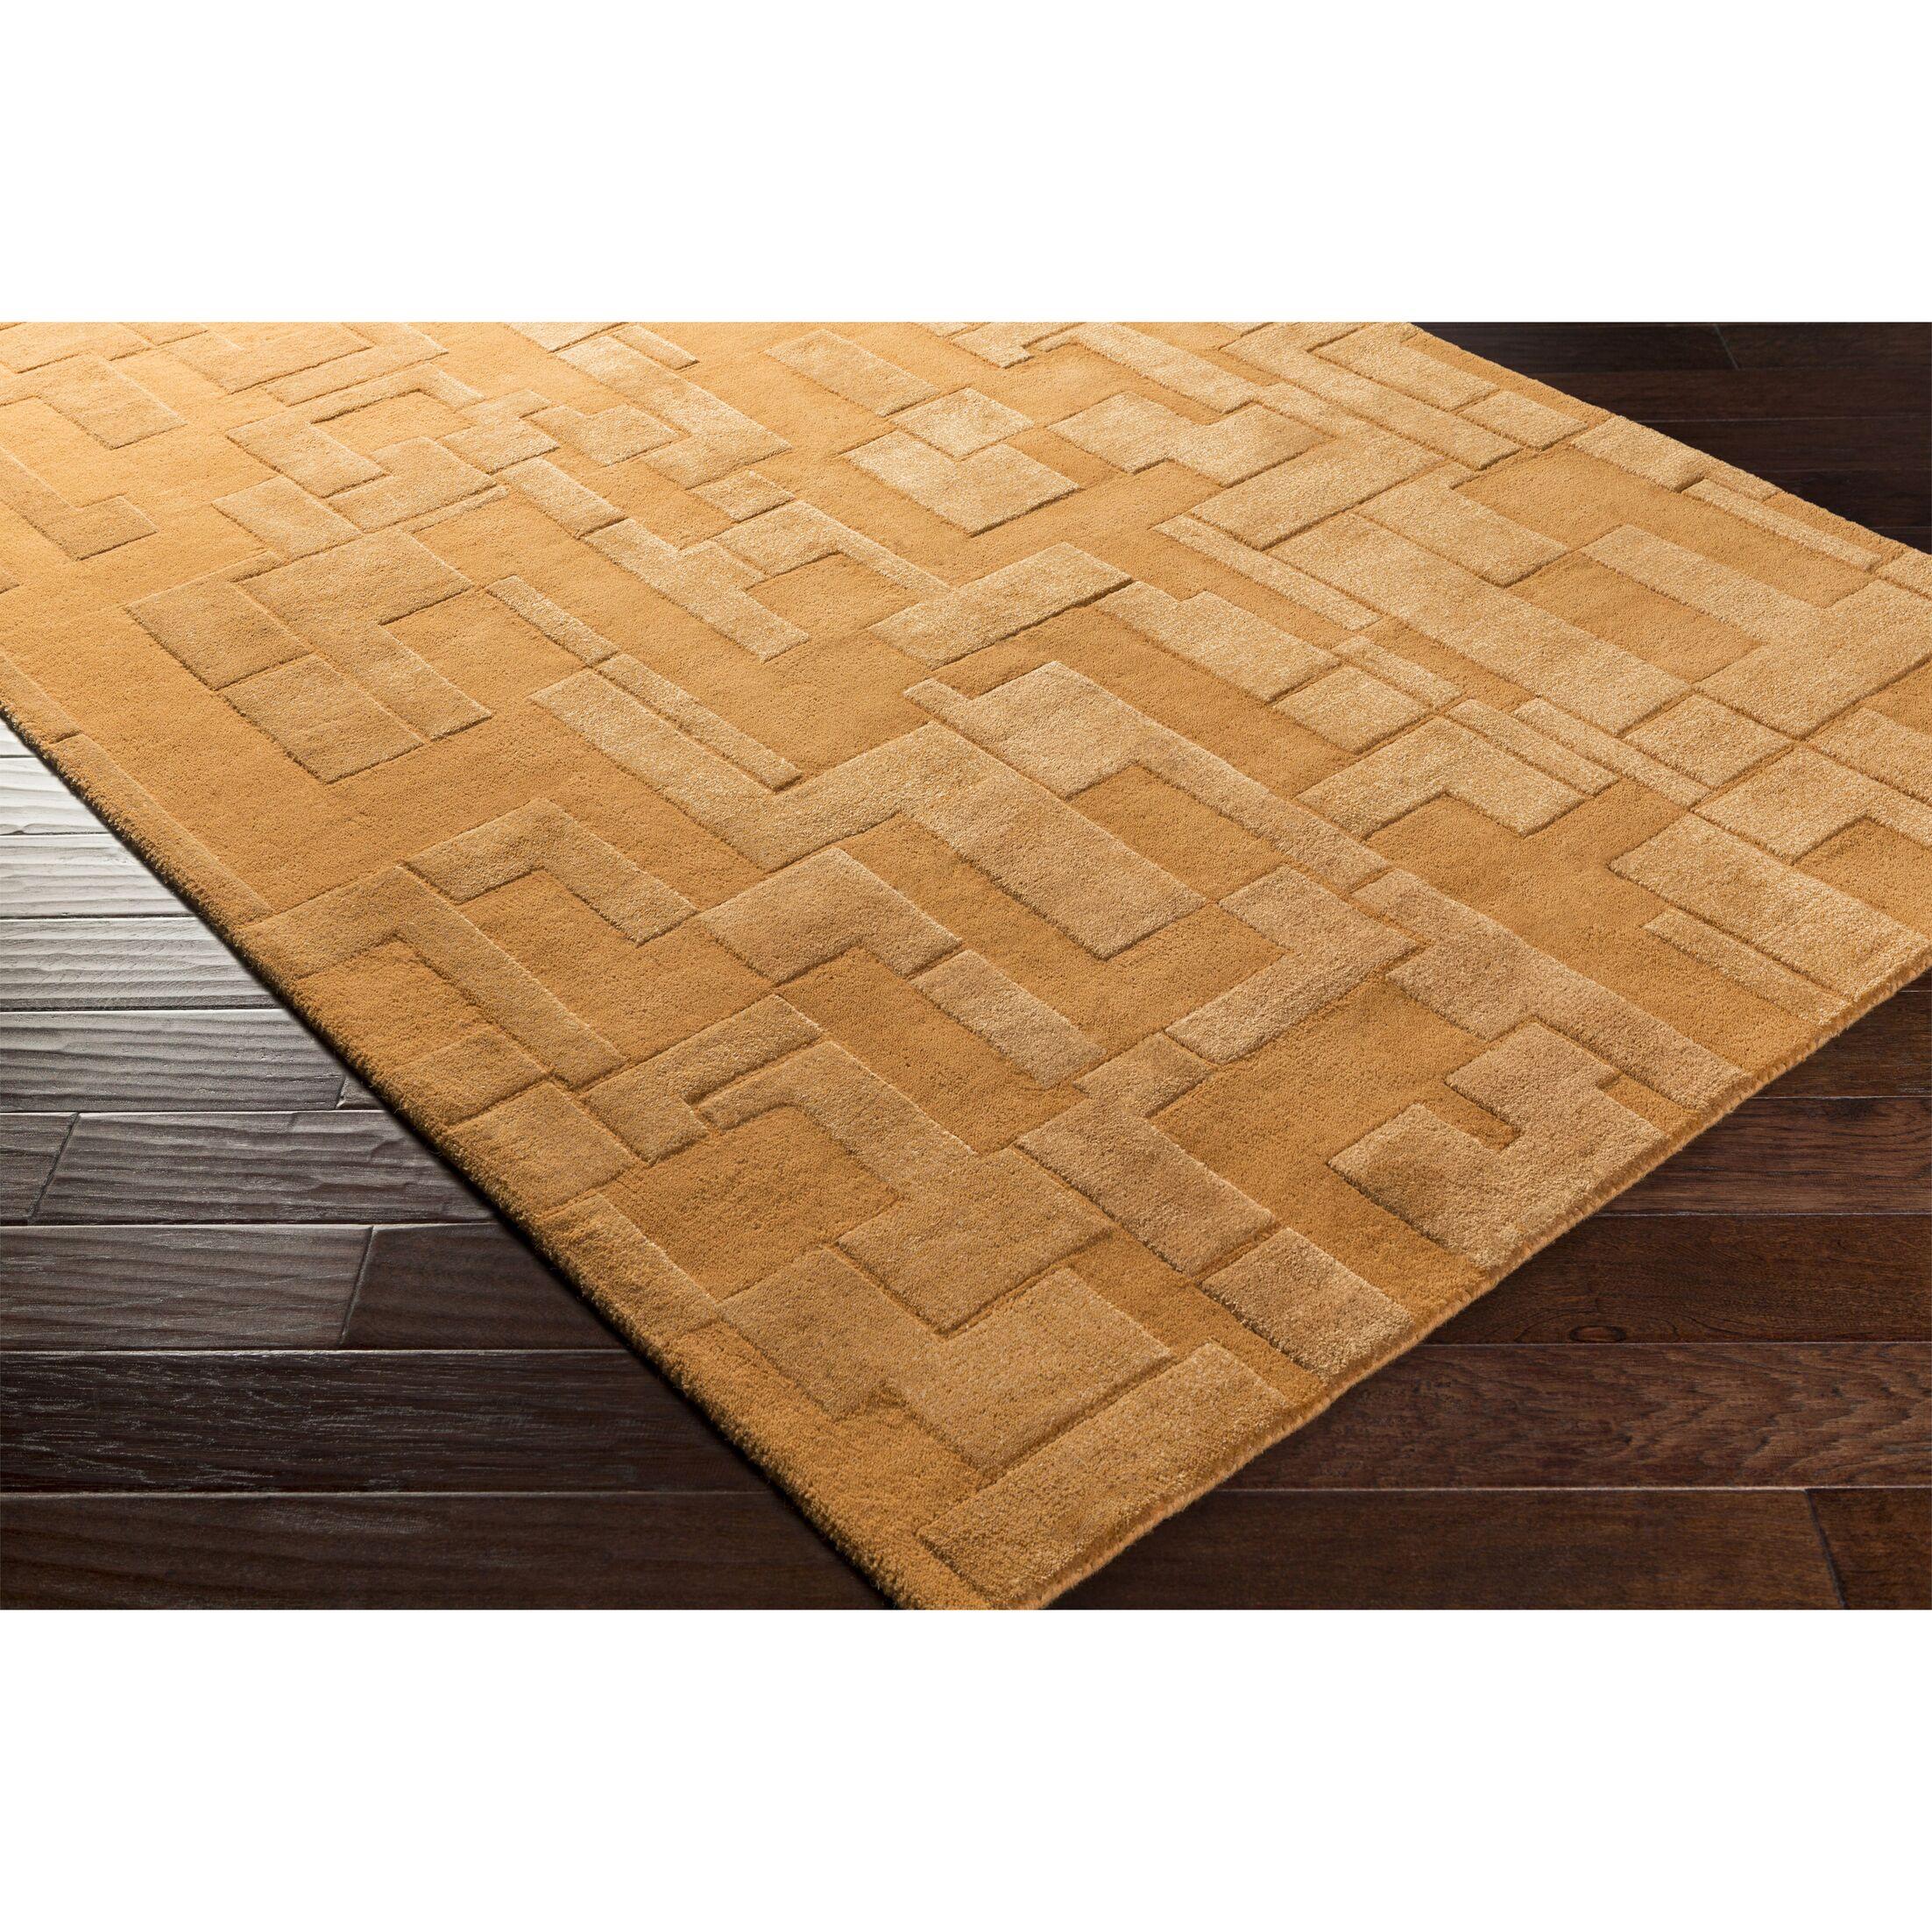 Dionne Hand-Tufted Orange Area Rug Rug Size: Rectangle 5' x 7'6